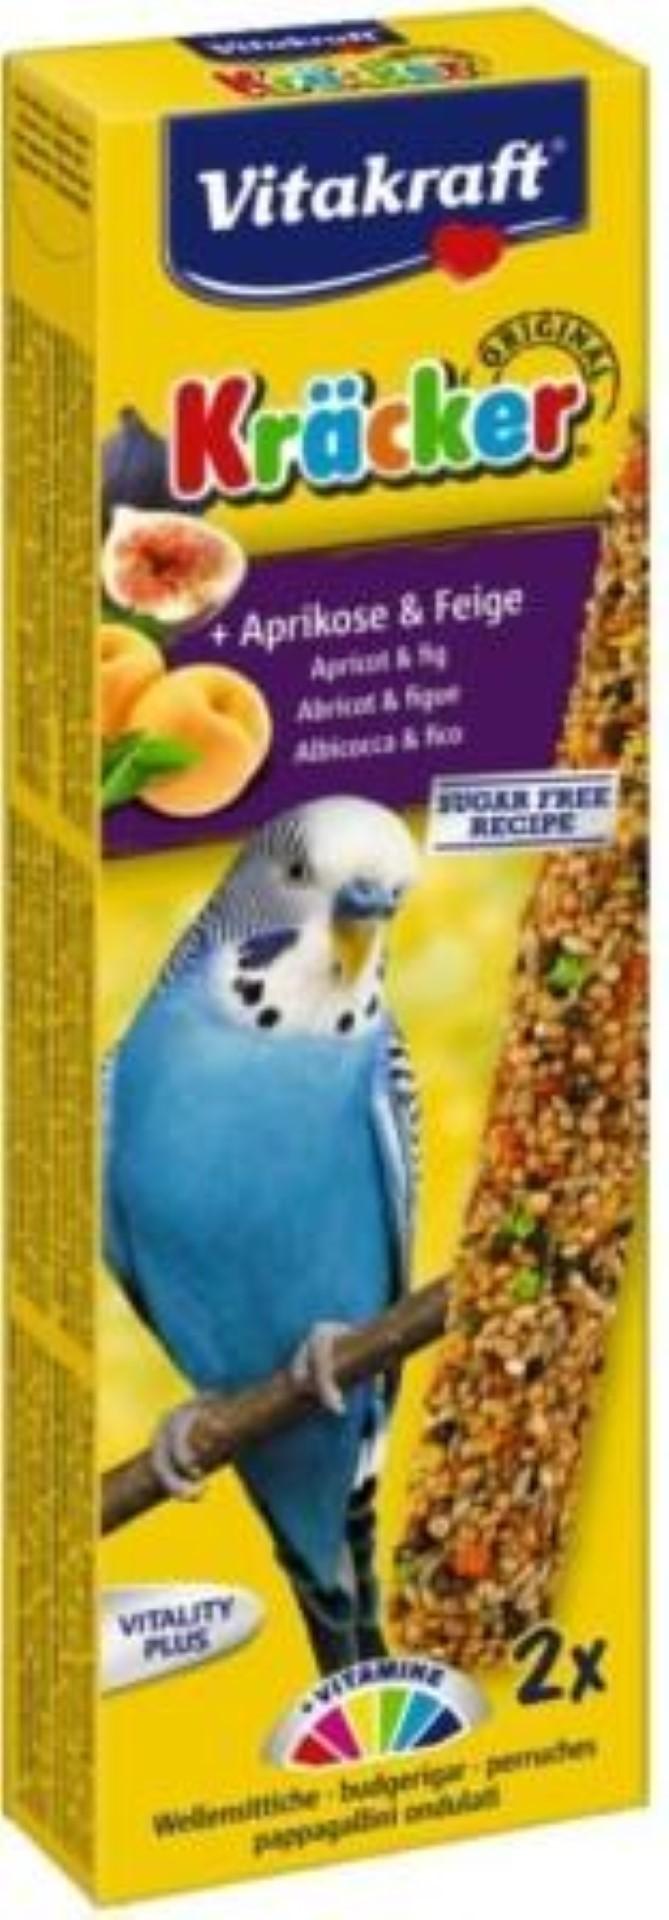 Vitakraft abrikoos/vijg-kracker parkiet 2in1